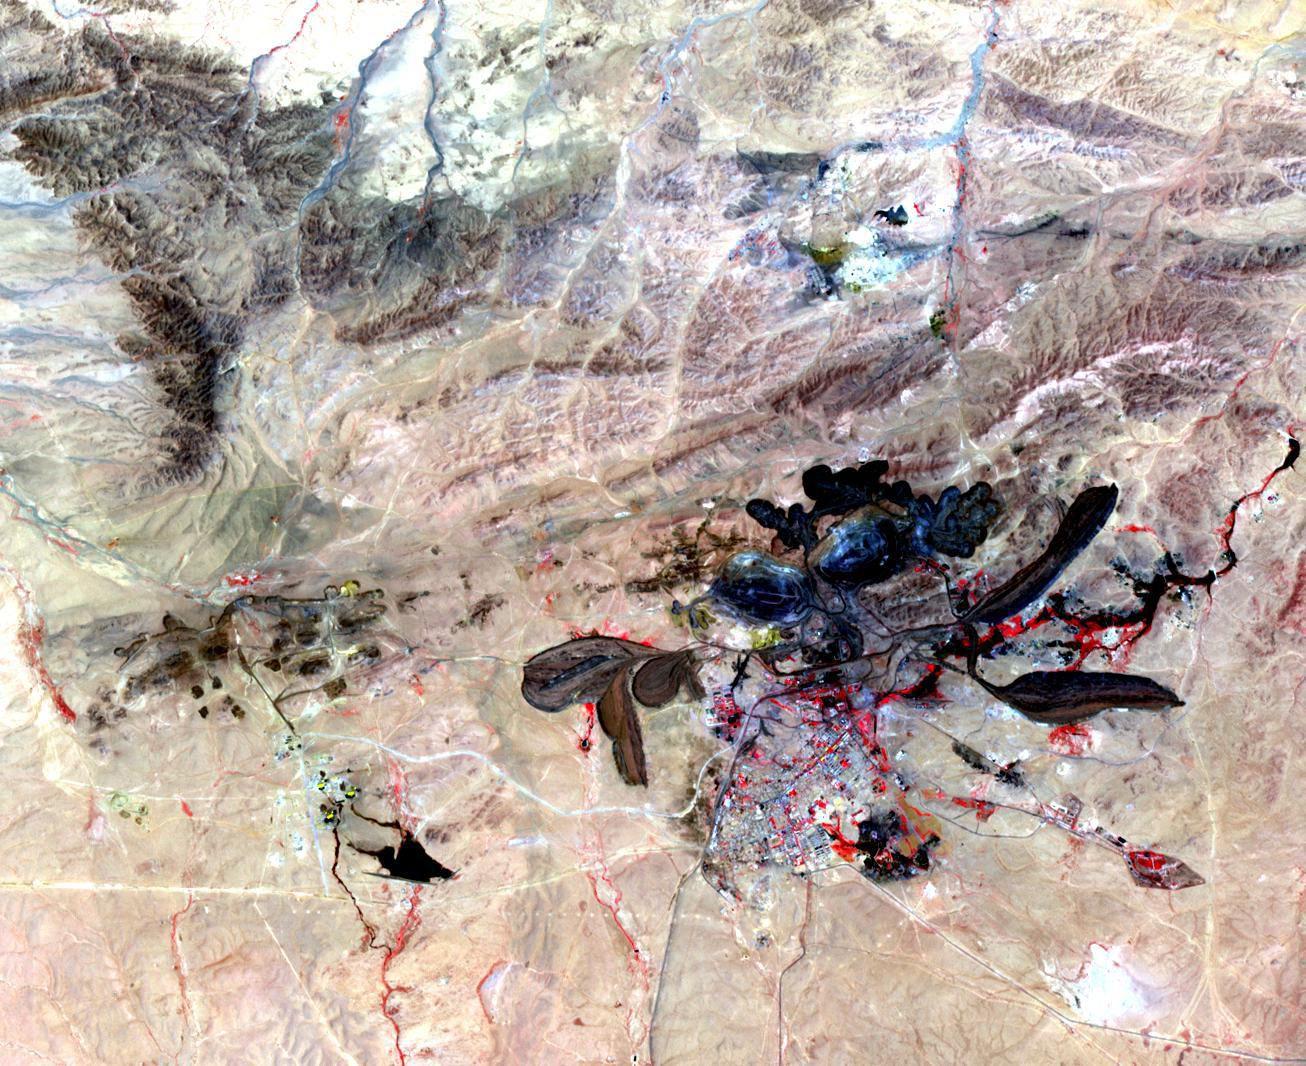 Satbild der Woche / Baiyun Ebo / Mongolei / WISSENSCHAFT